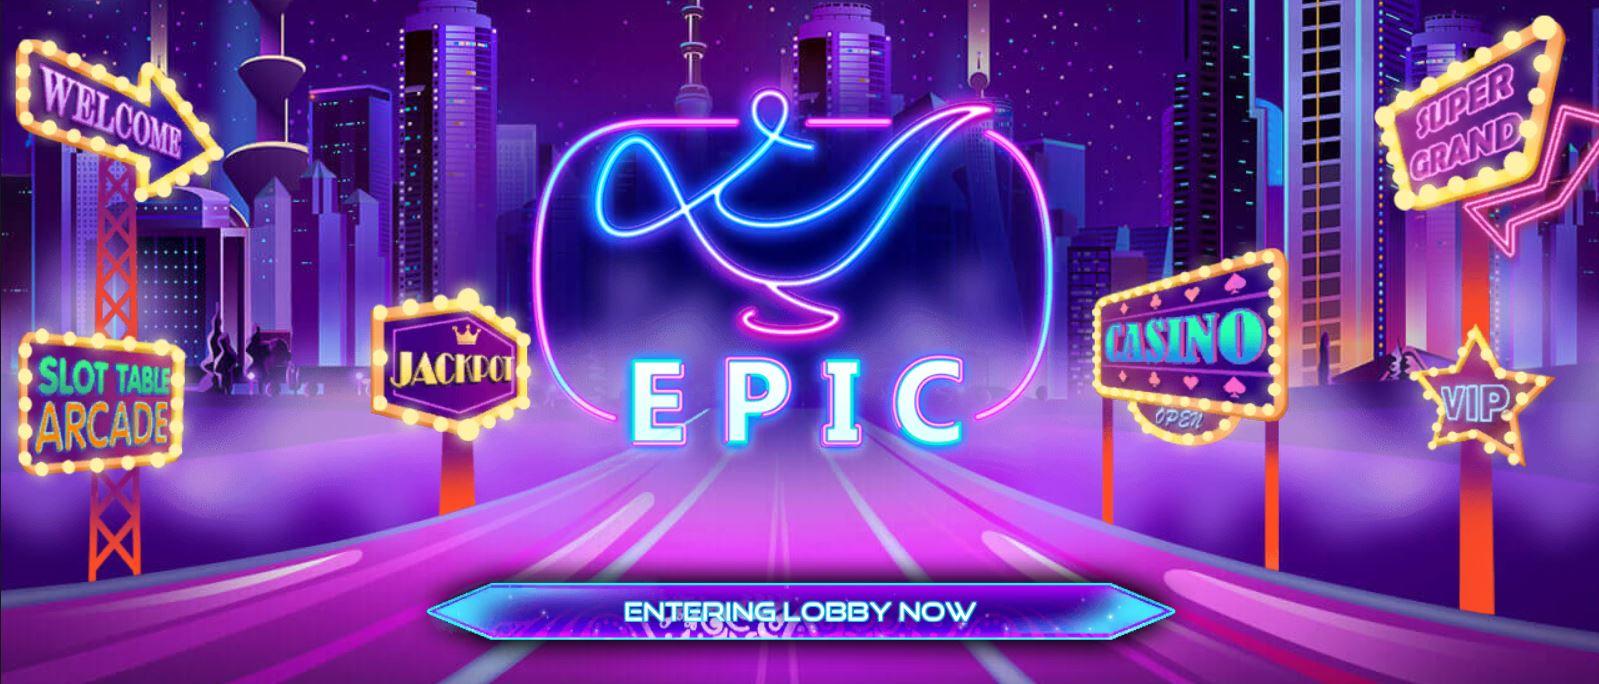 Epicwin-lobby-now